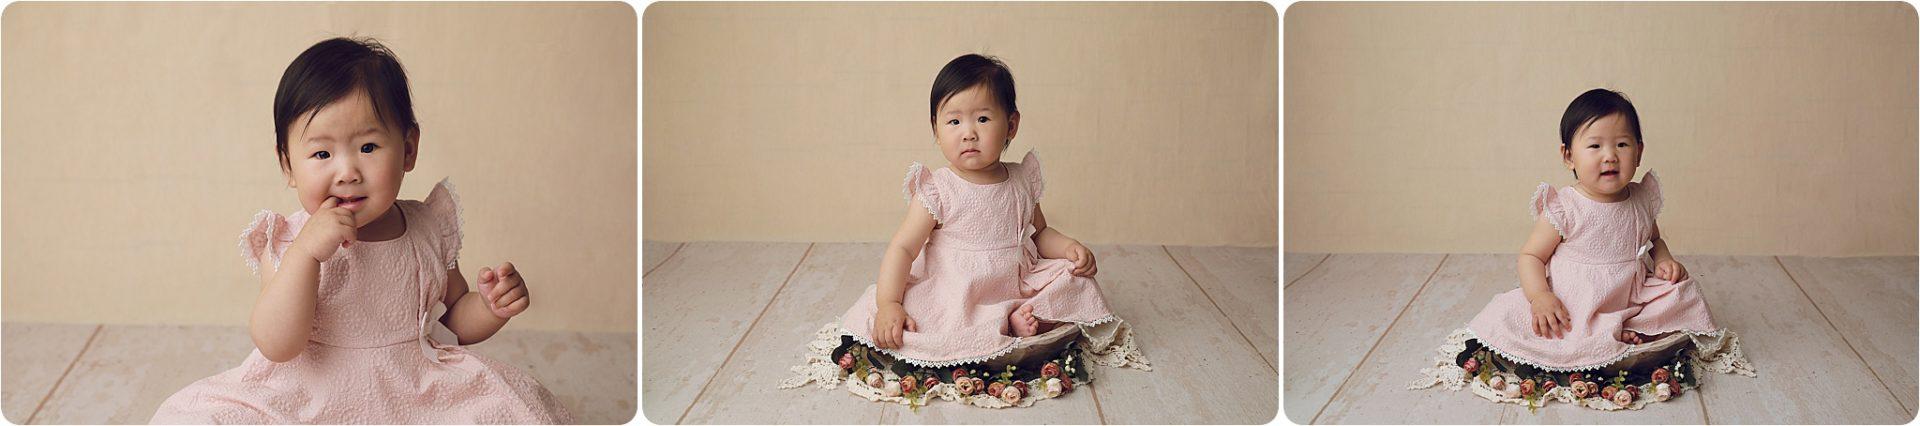 tucson child and baby portraits